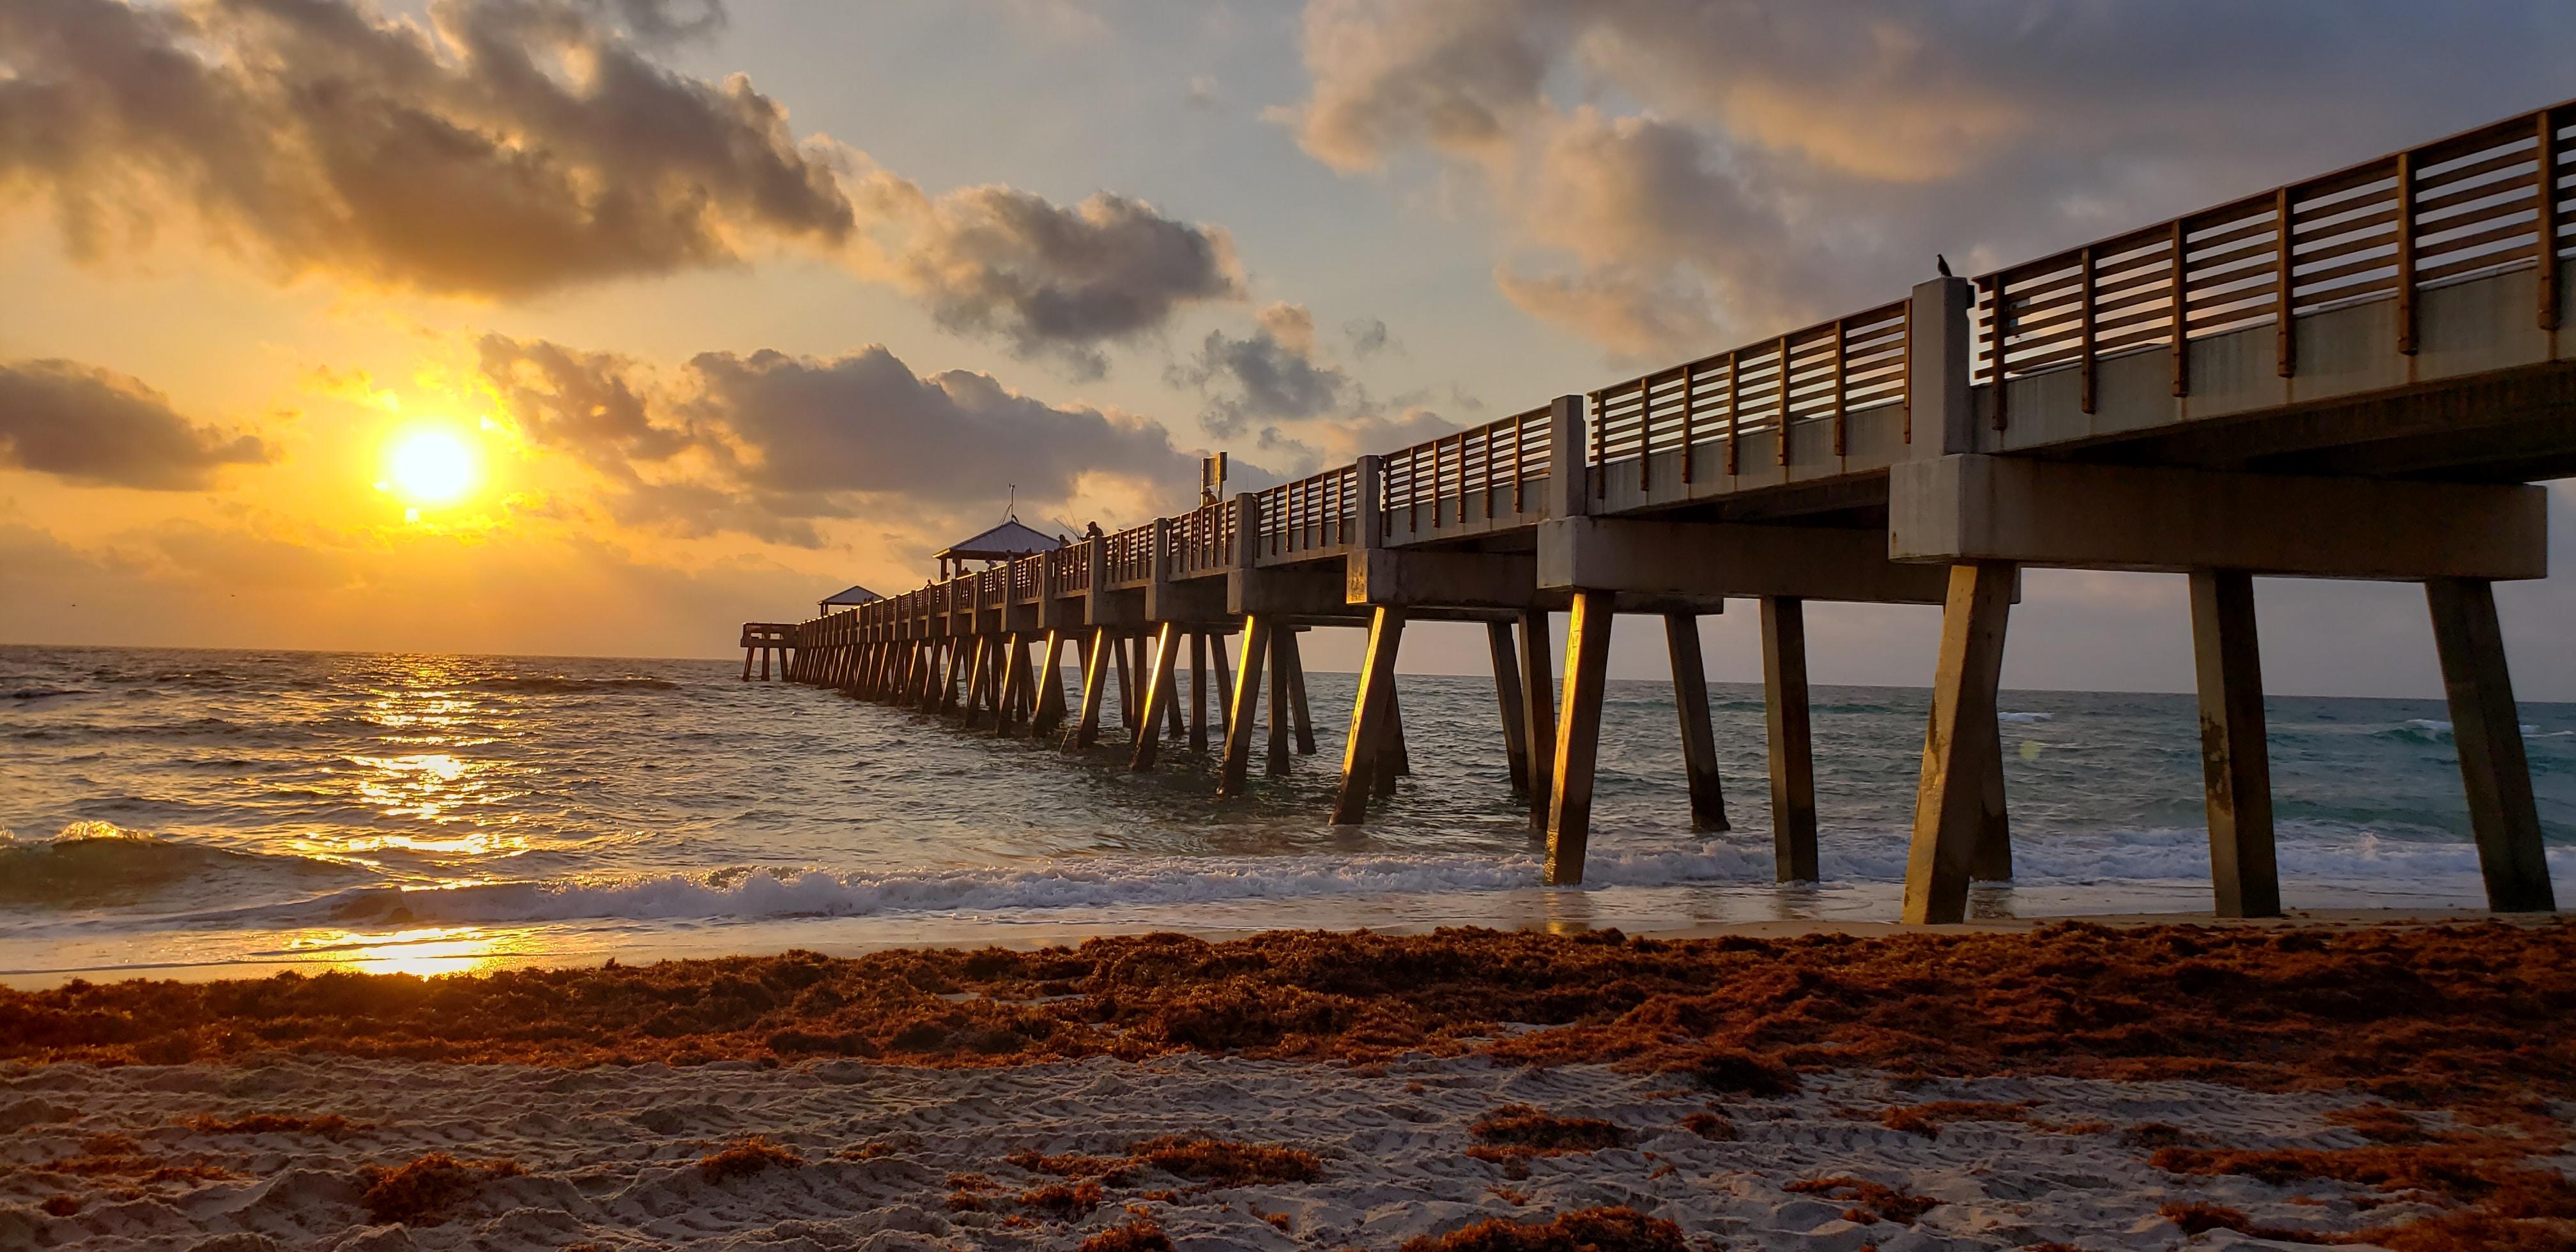 Hurricane Dorian Updates - South Florida